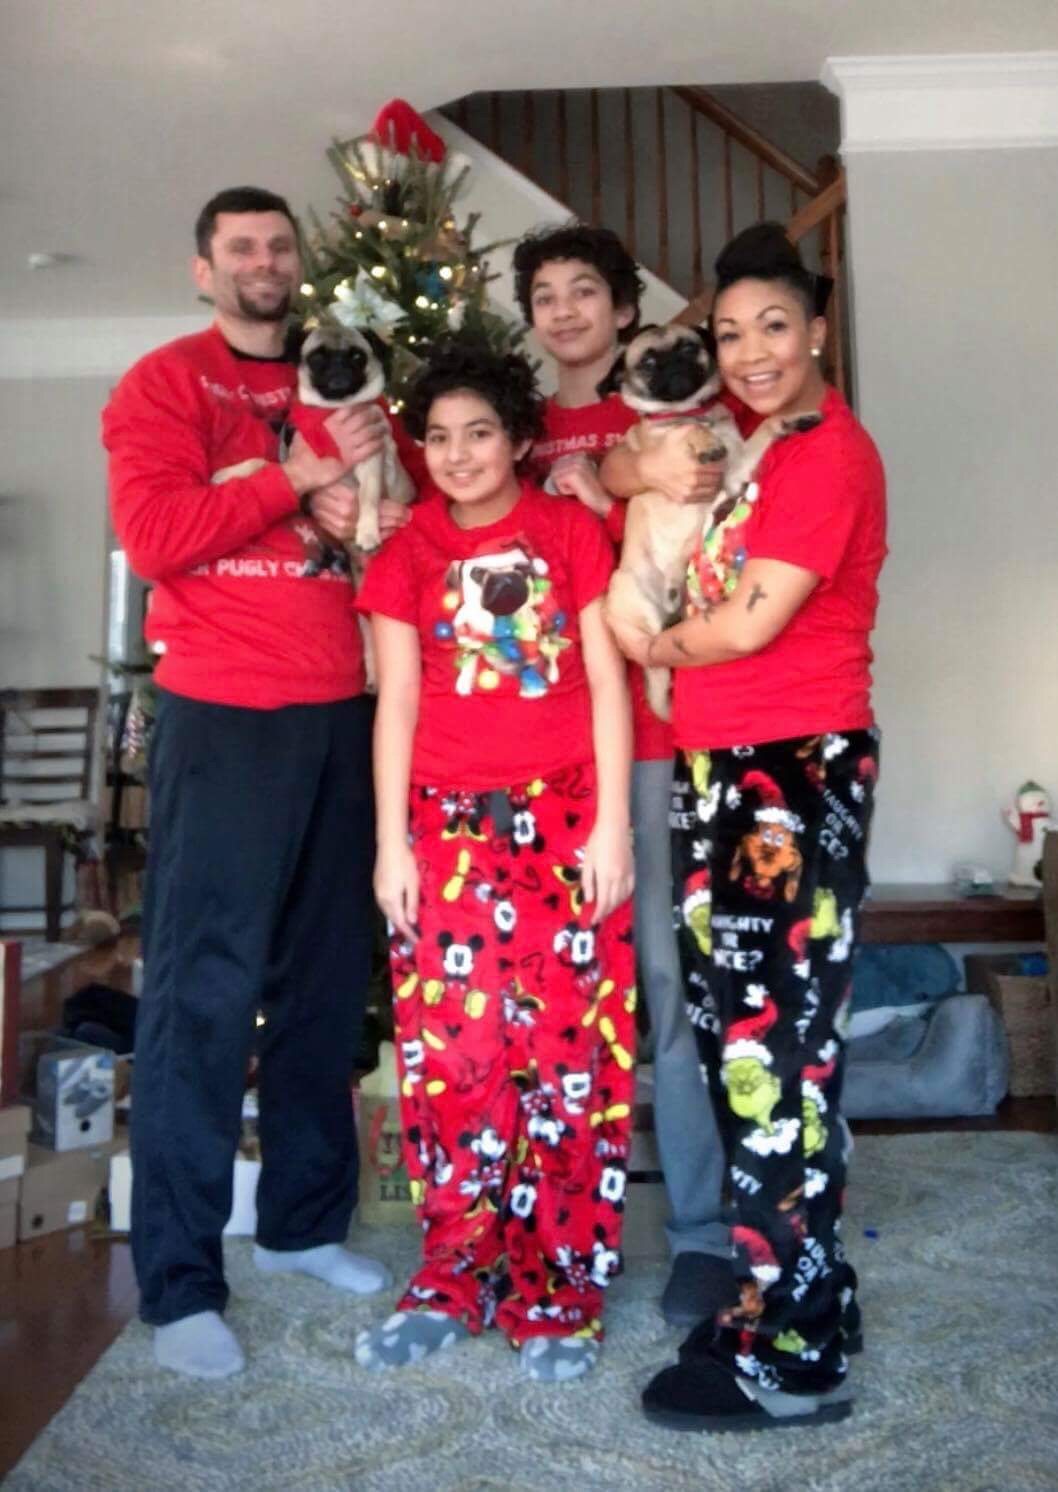 Nikki and family